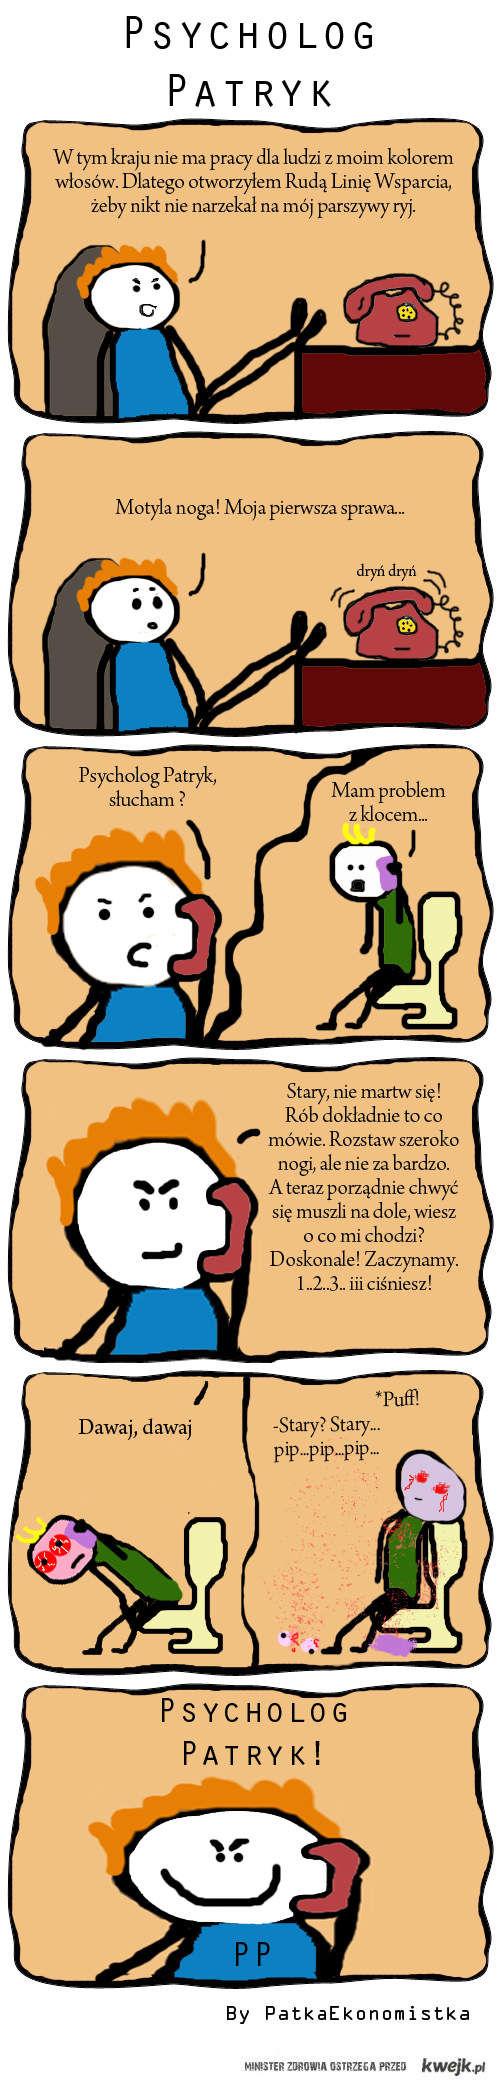 Psycholog Patryk :D